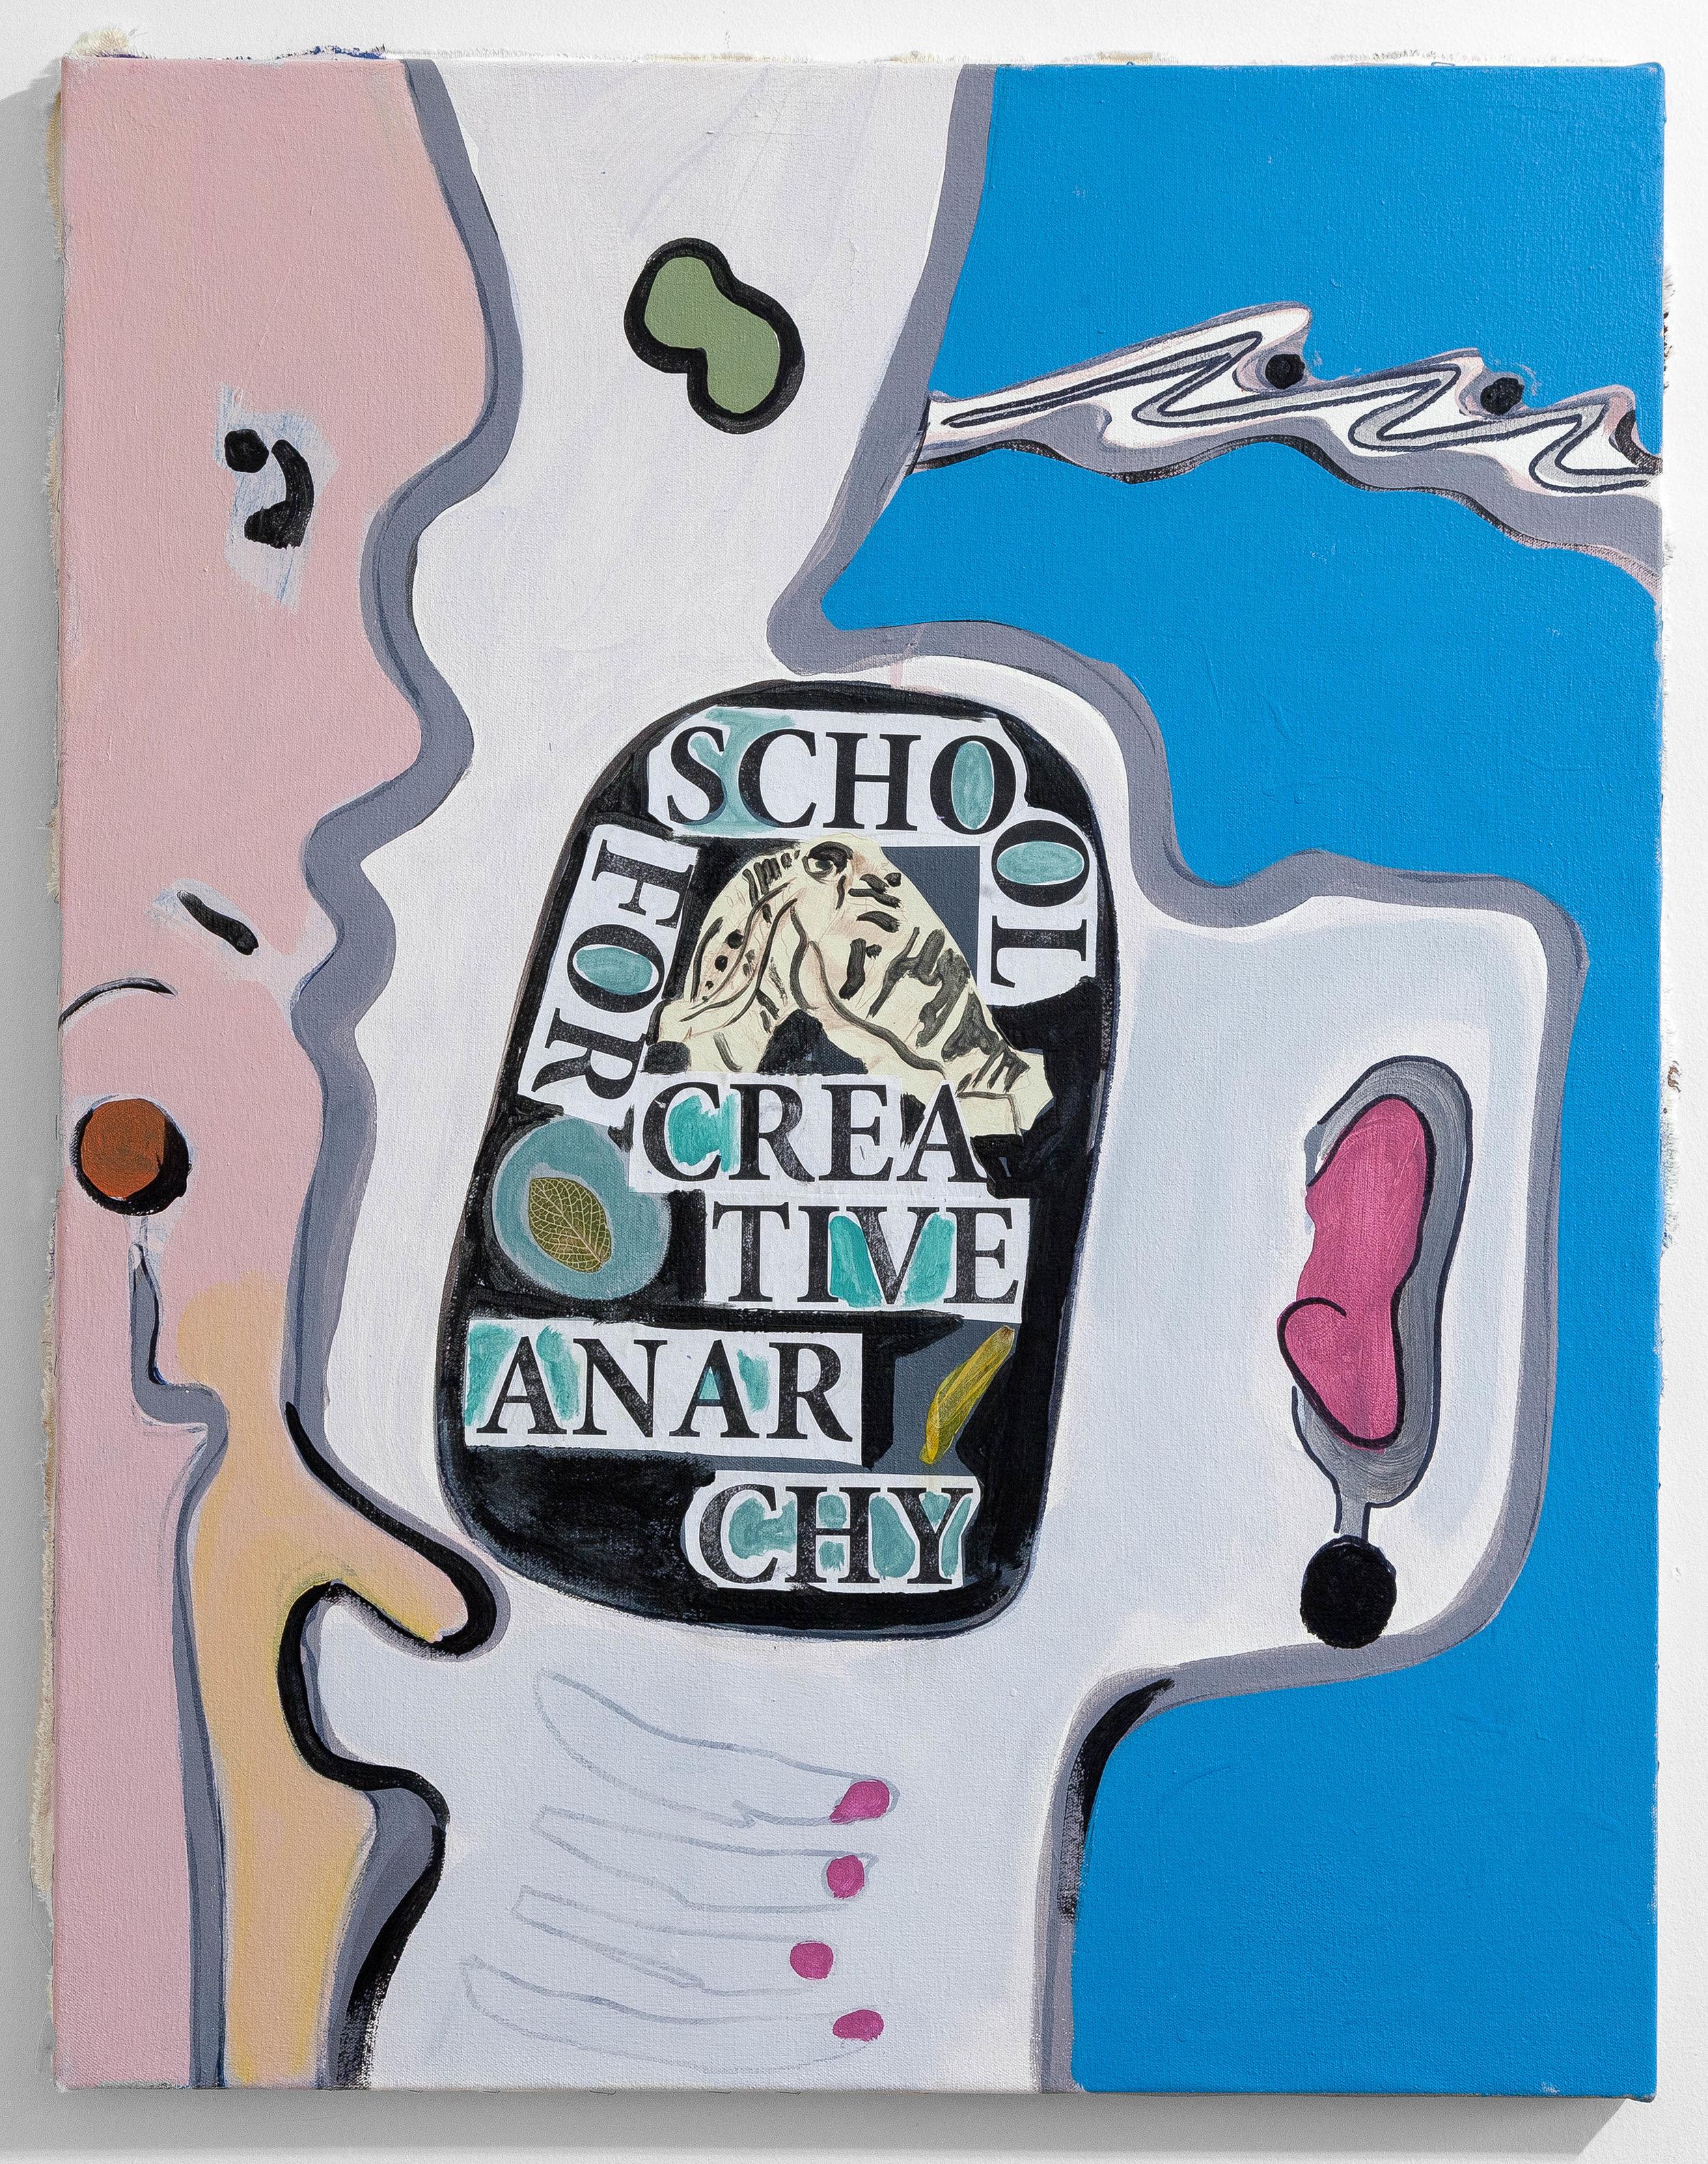 School for Creative Anarchy